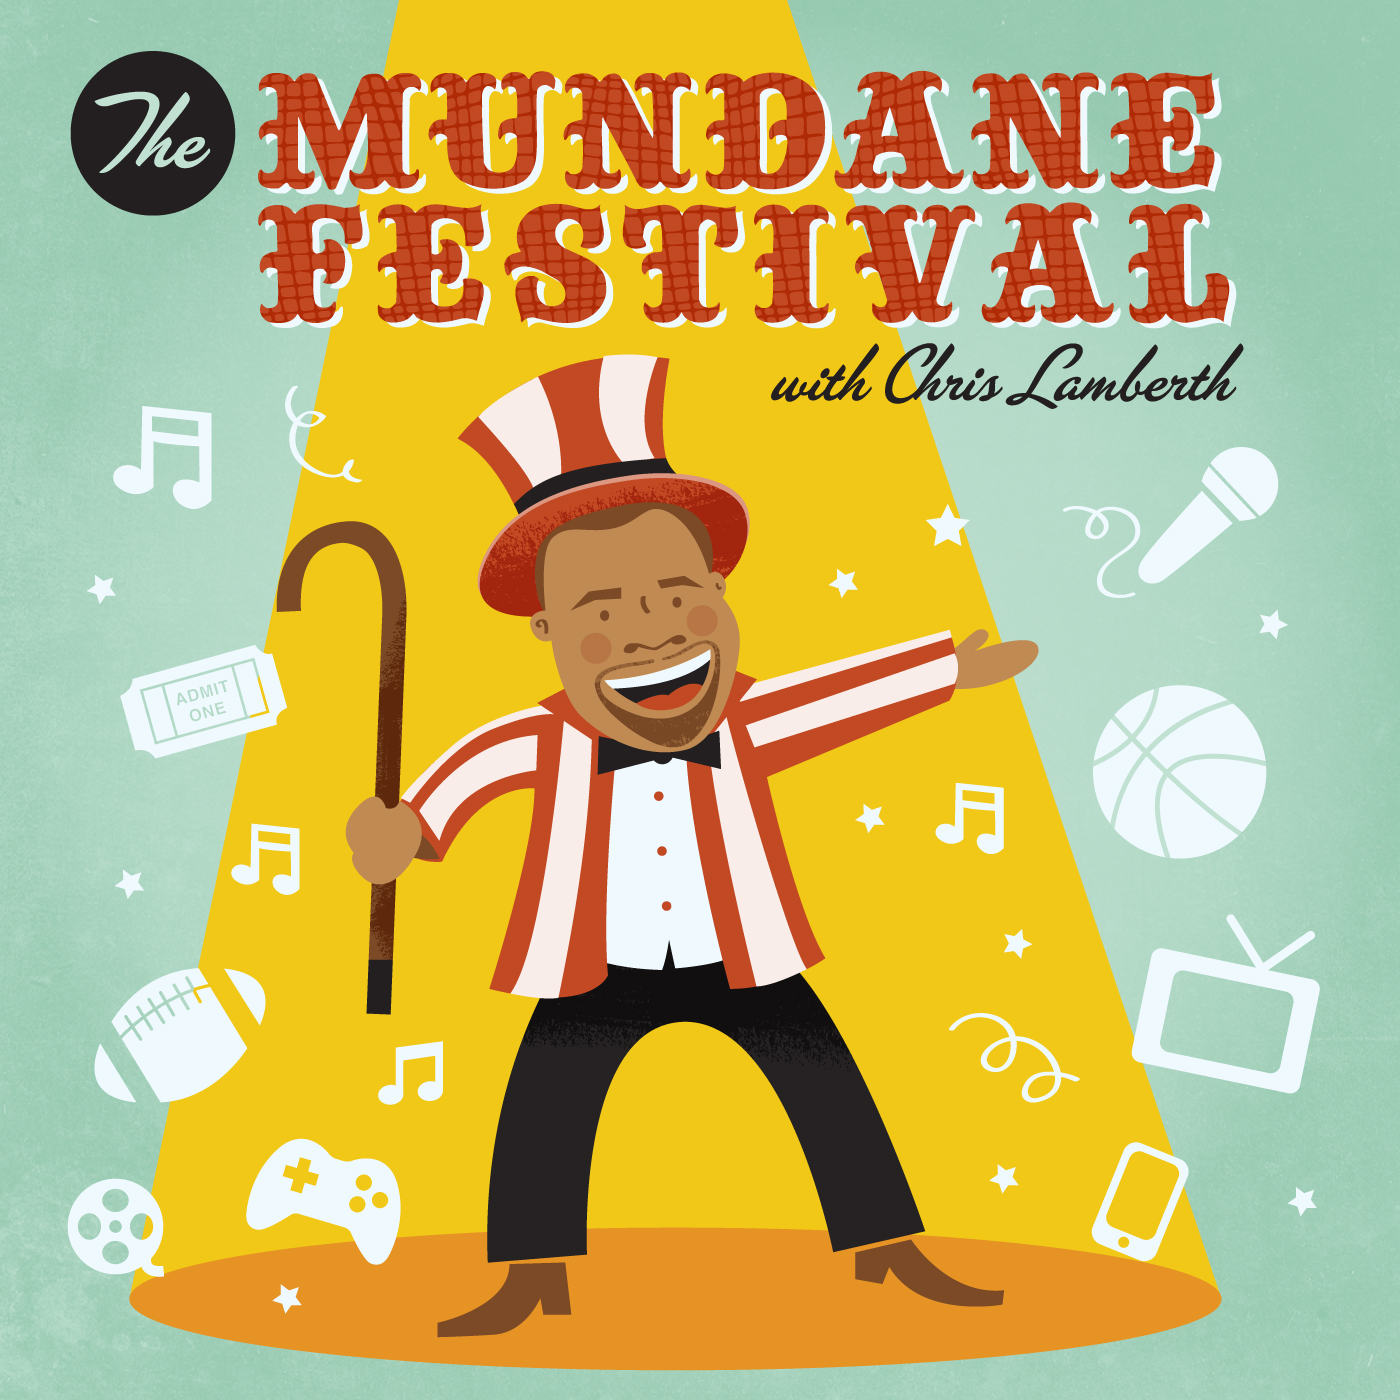 The Mundane Festival